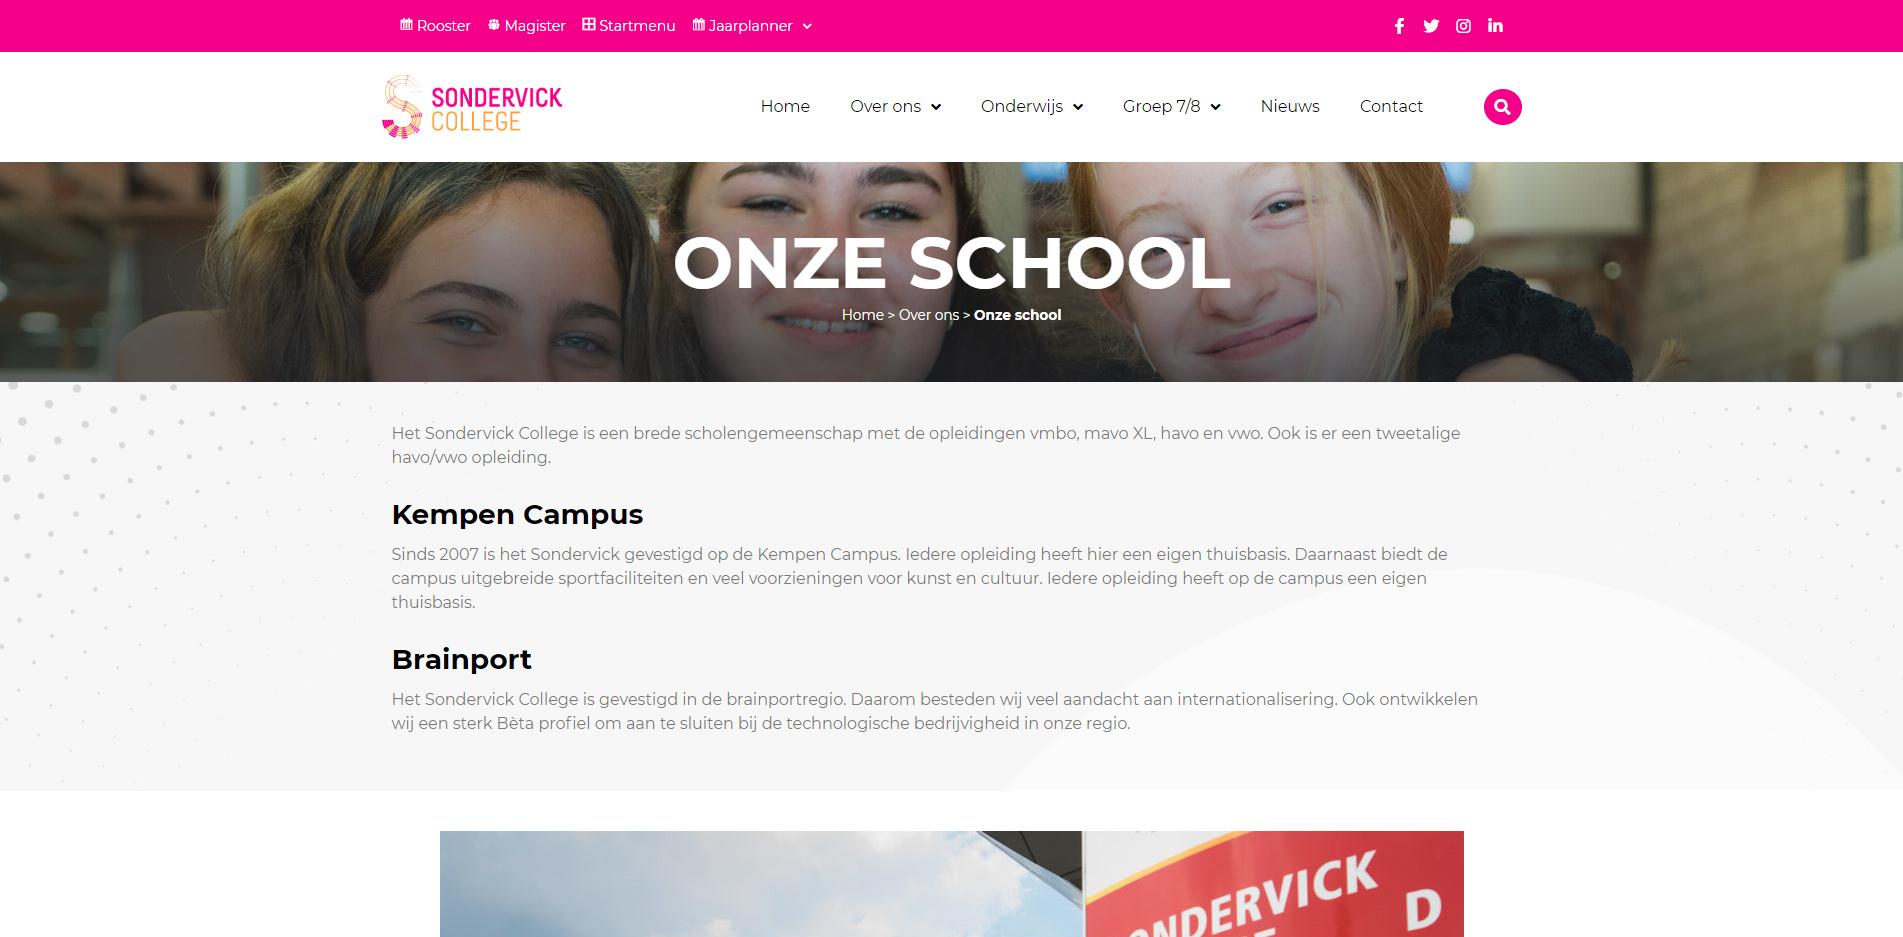 sondervick-onzeschool